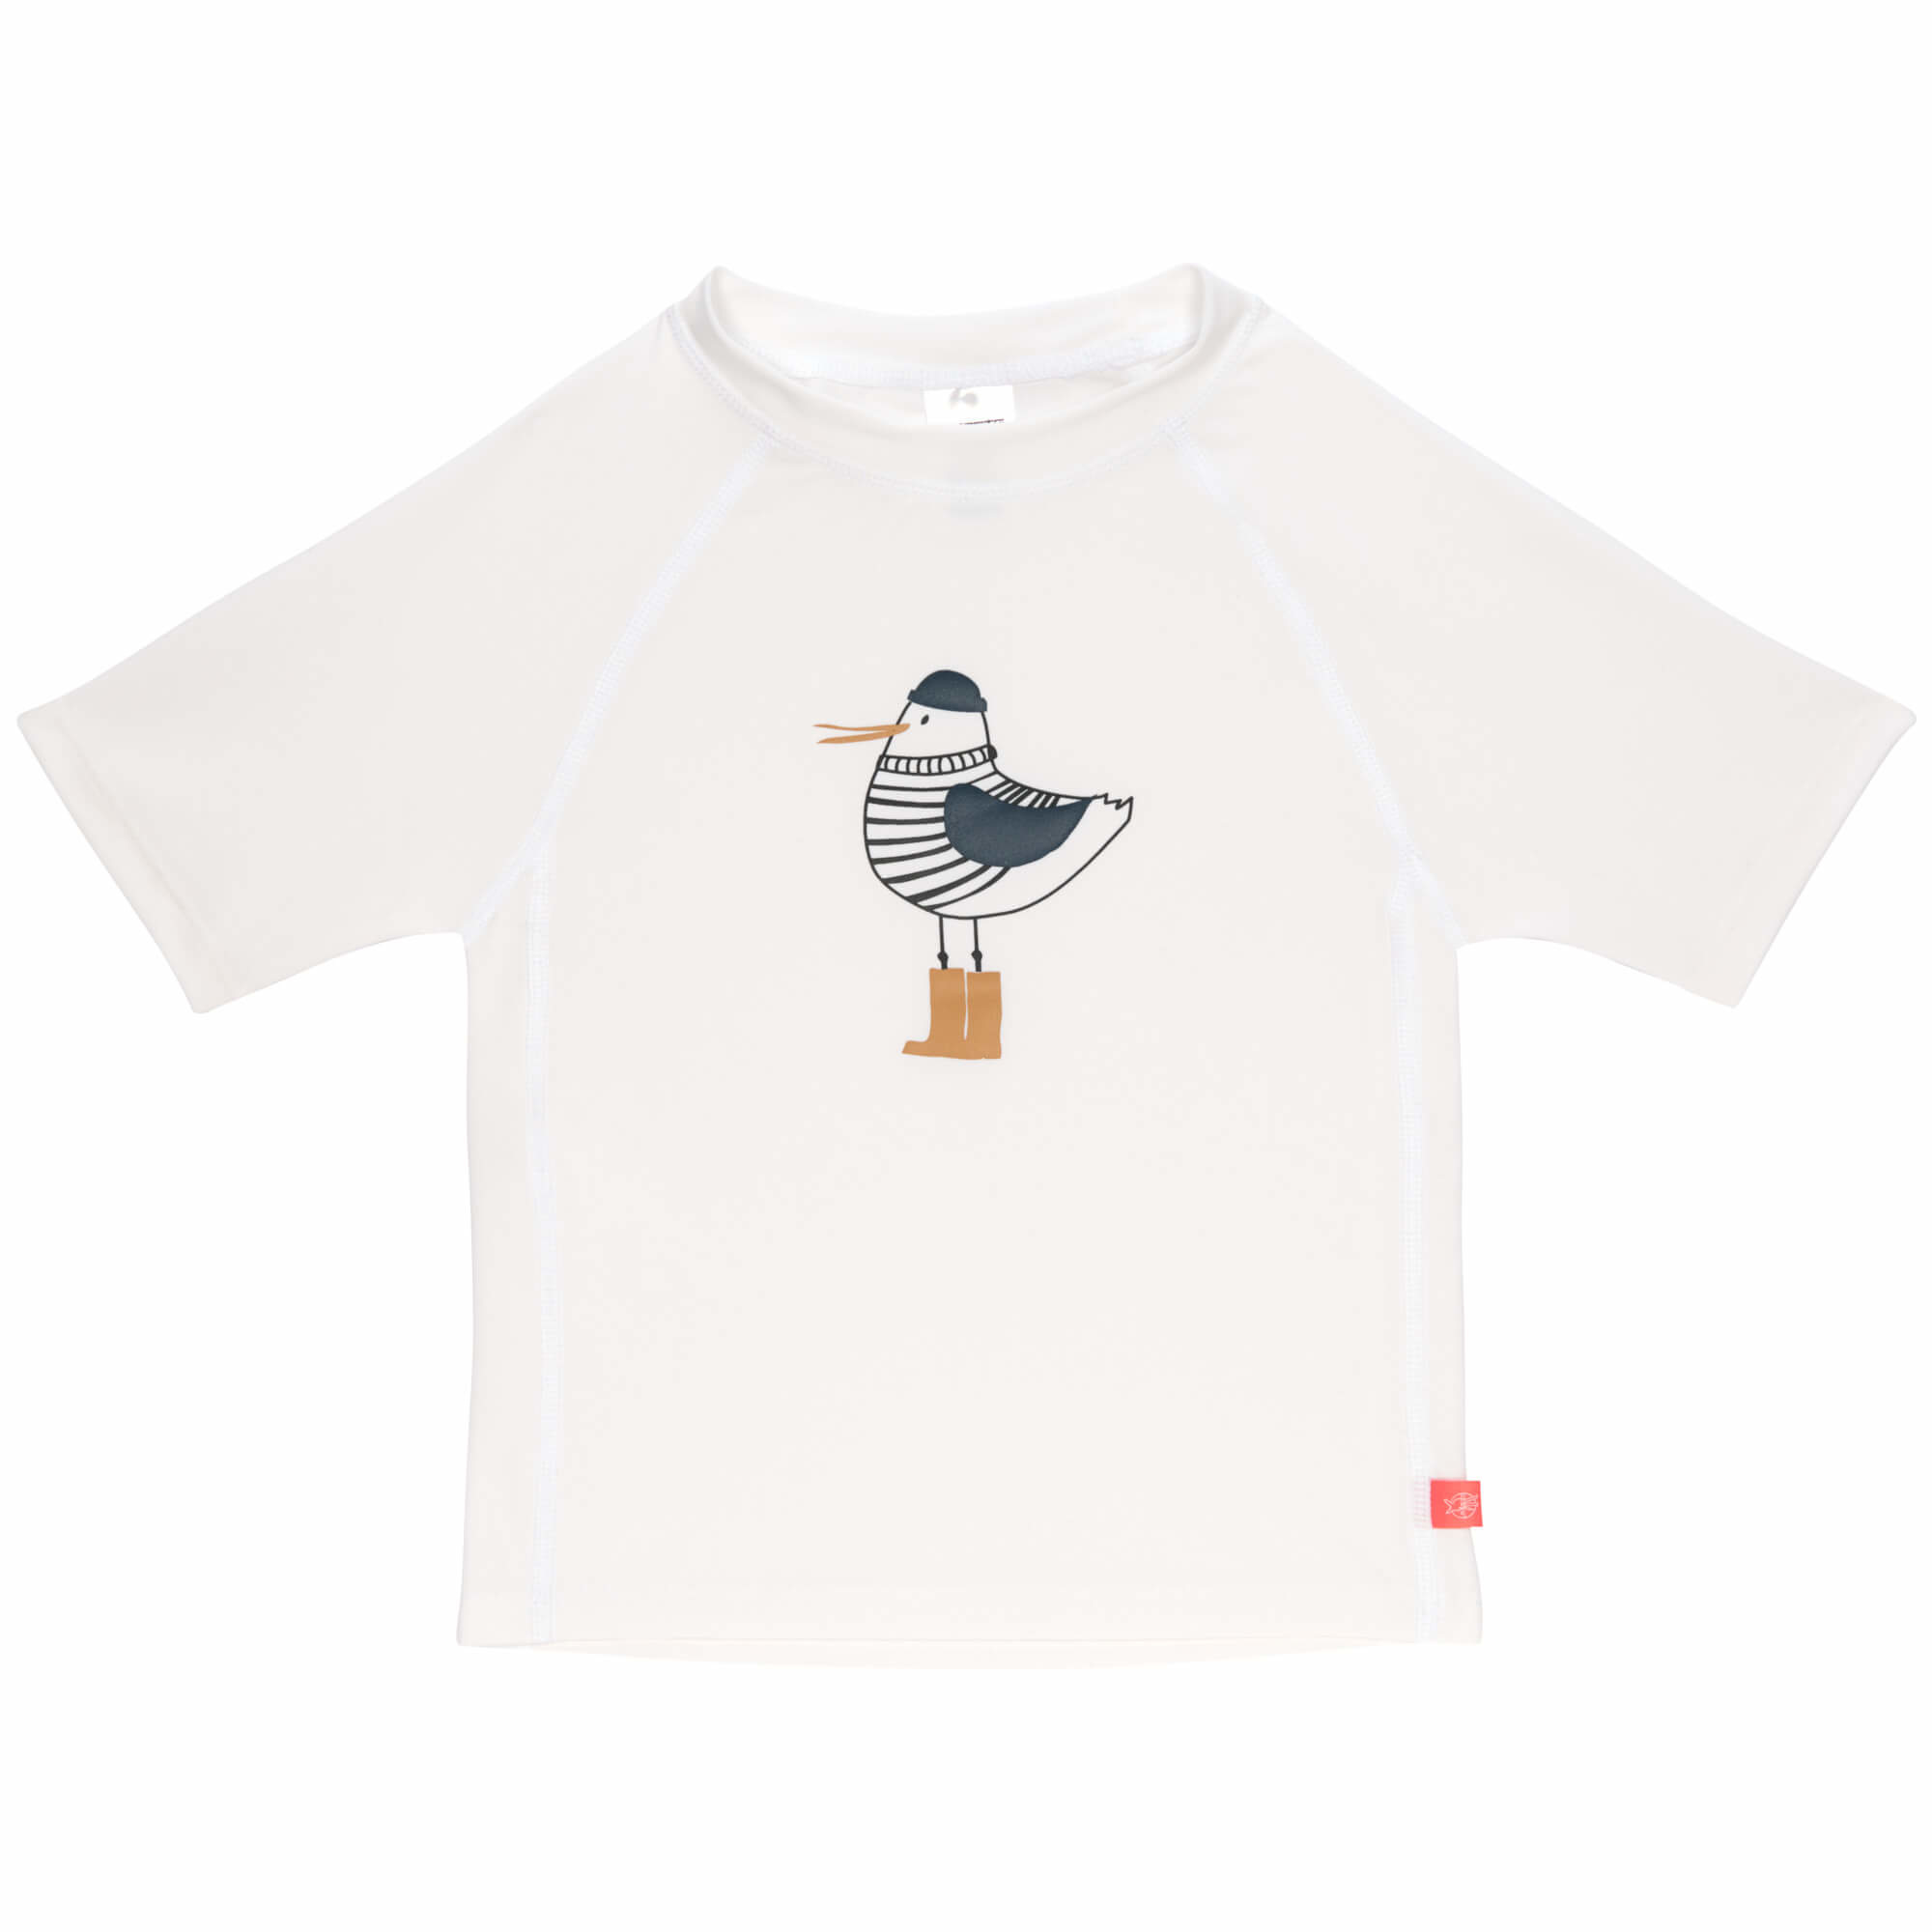 Lässig Lässig Splash & Fun Korte mouw Rashguard / zwemshirt Mr. Seagull white